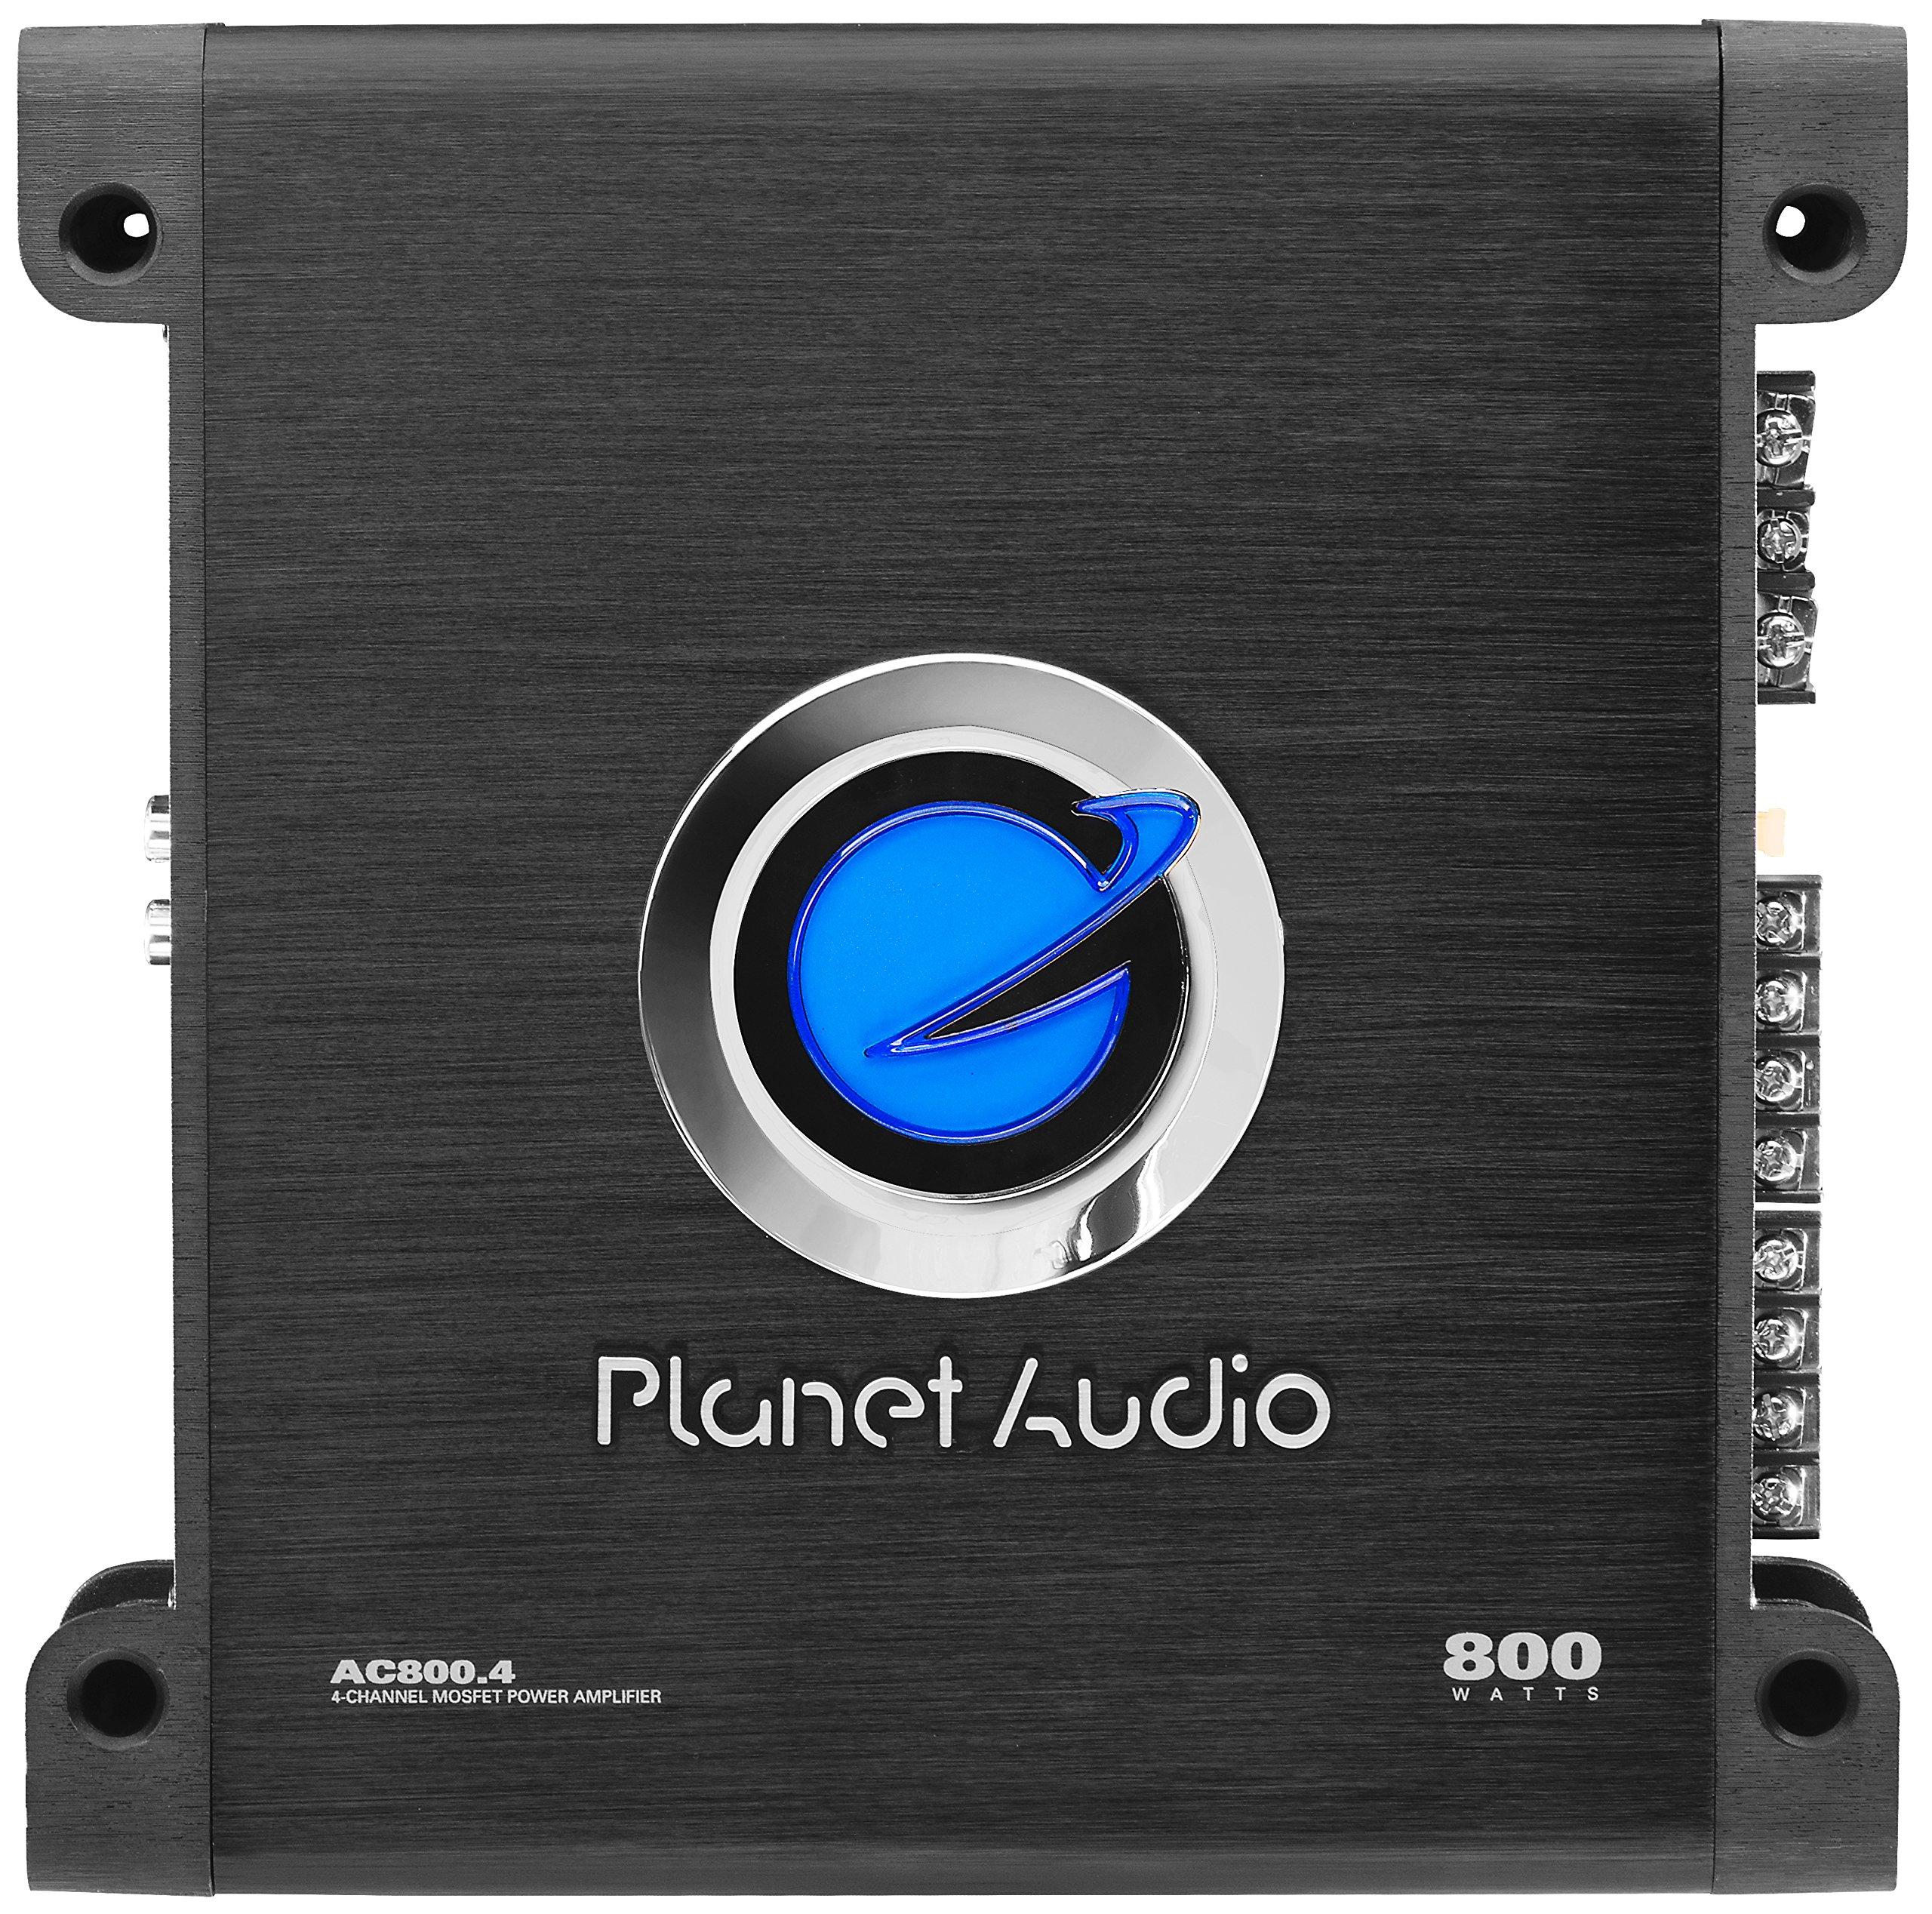 Planet Audio AC800.4 Anarchy 800 Watt, 4 Channel, 2/4 Ohm Stable Class A/B, Full Range, Bridgeable, MOSFET Car Amplifier